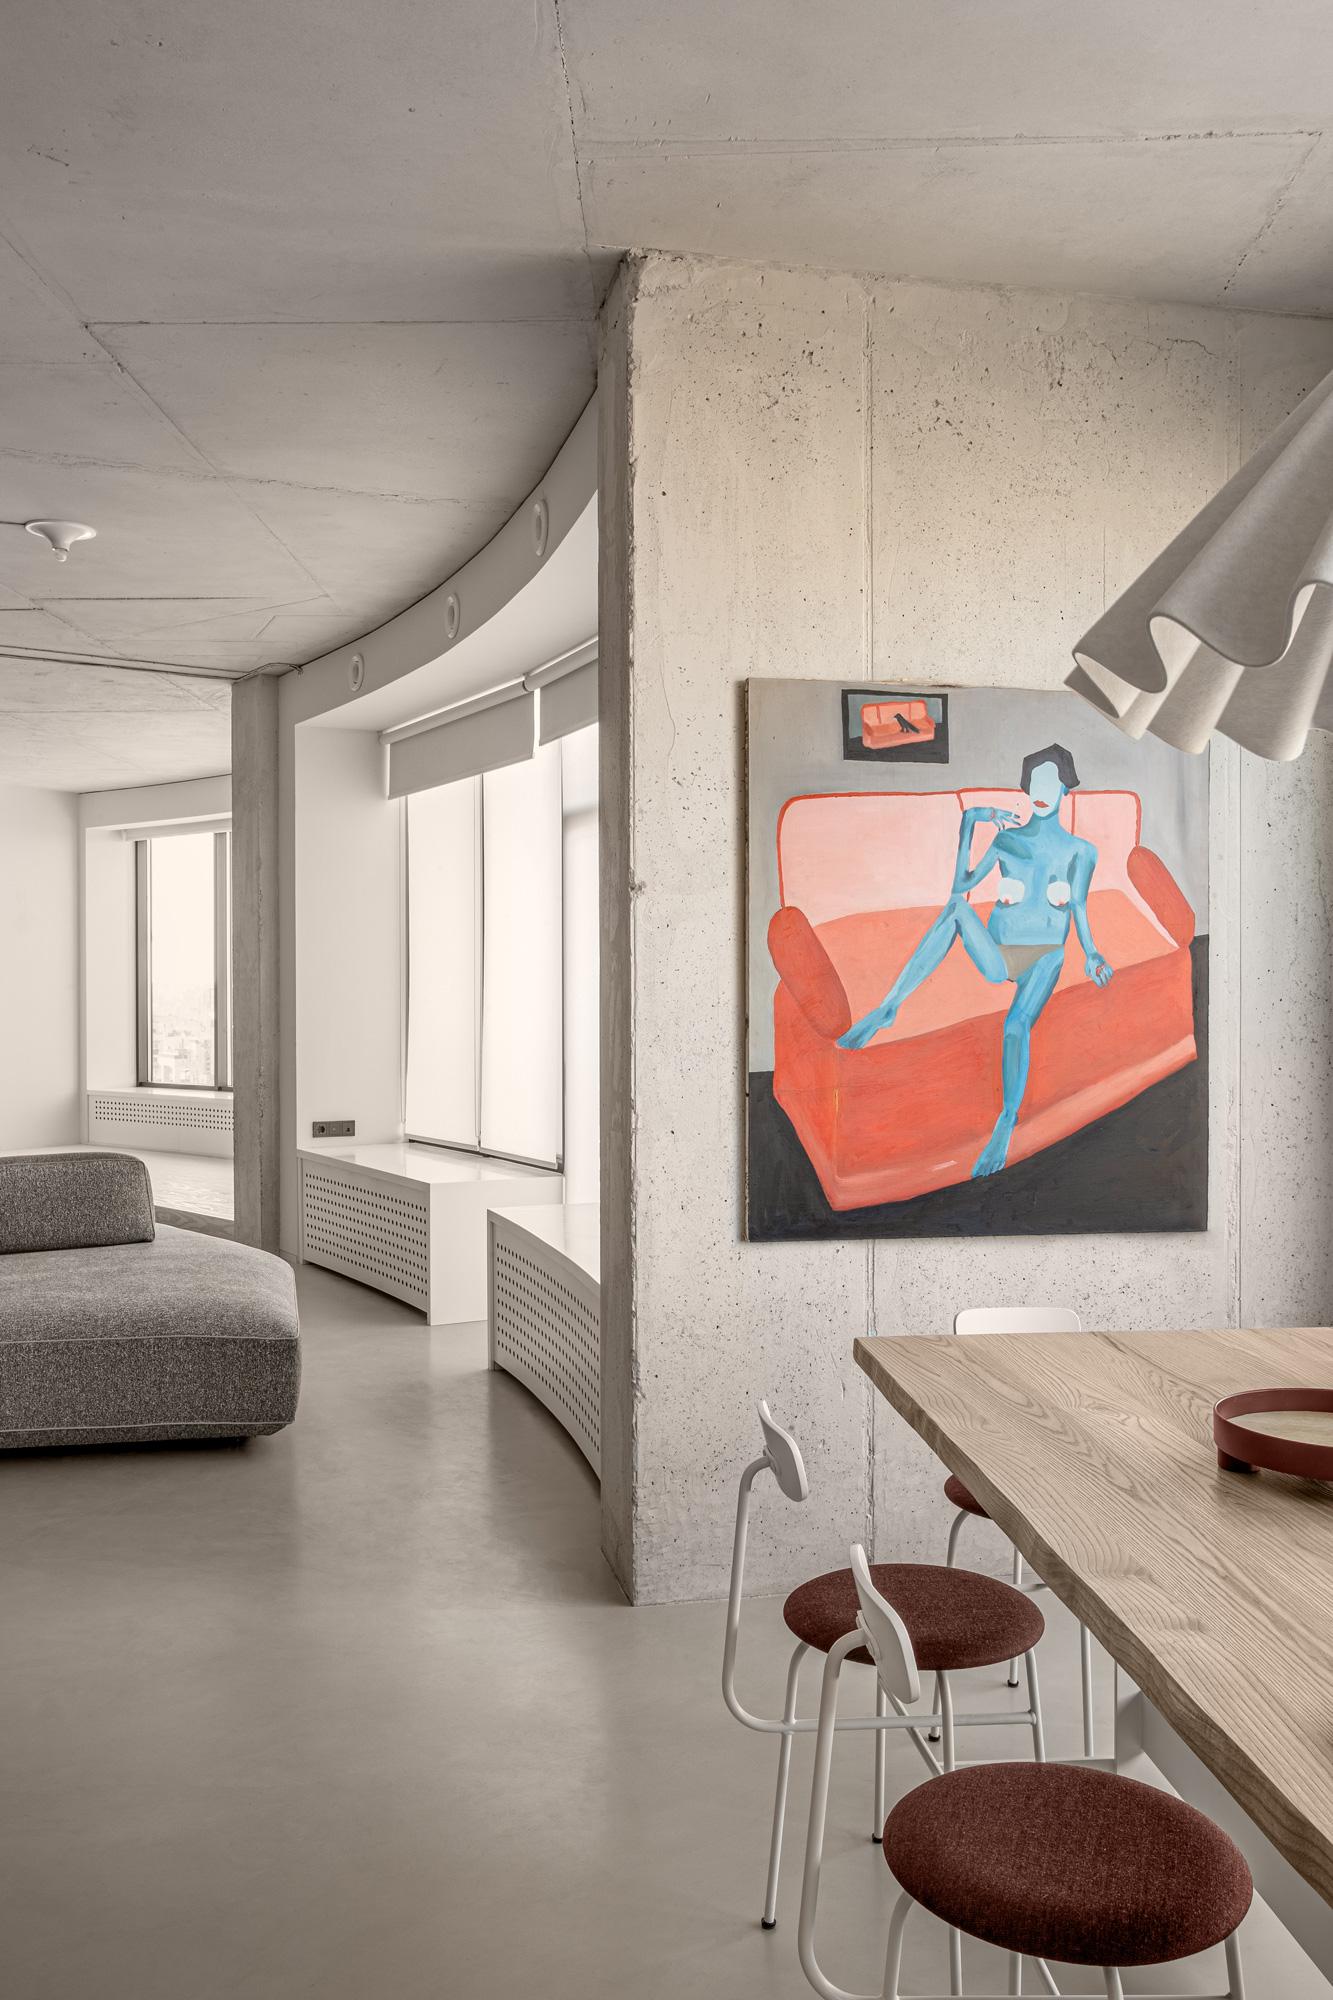 Elegant minimalistisches Apartment von Rina Lovko in Kiew